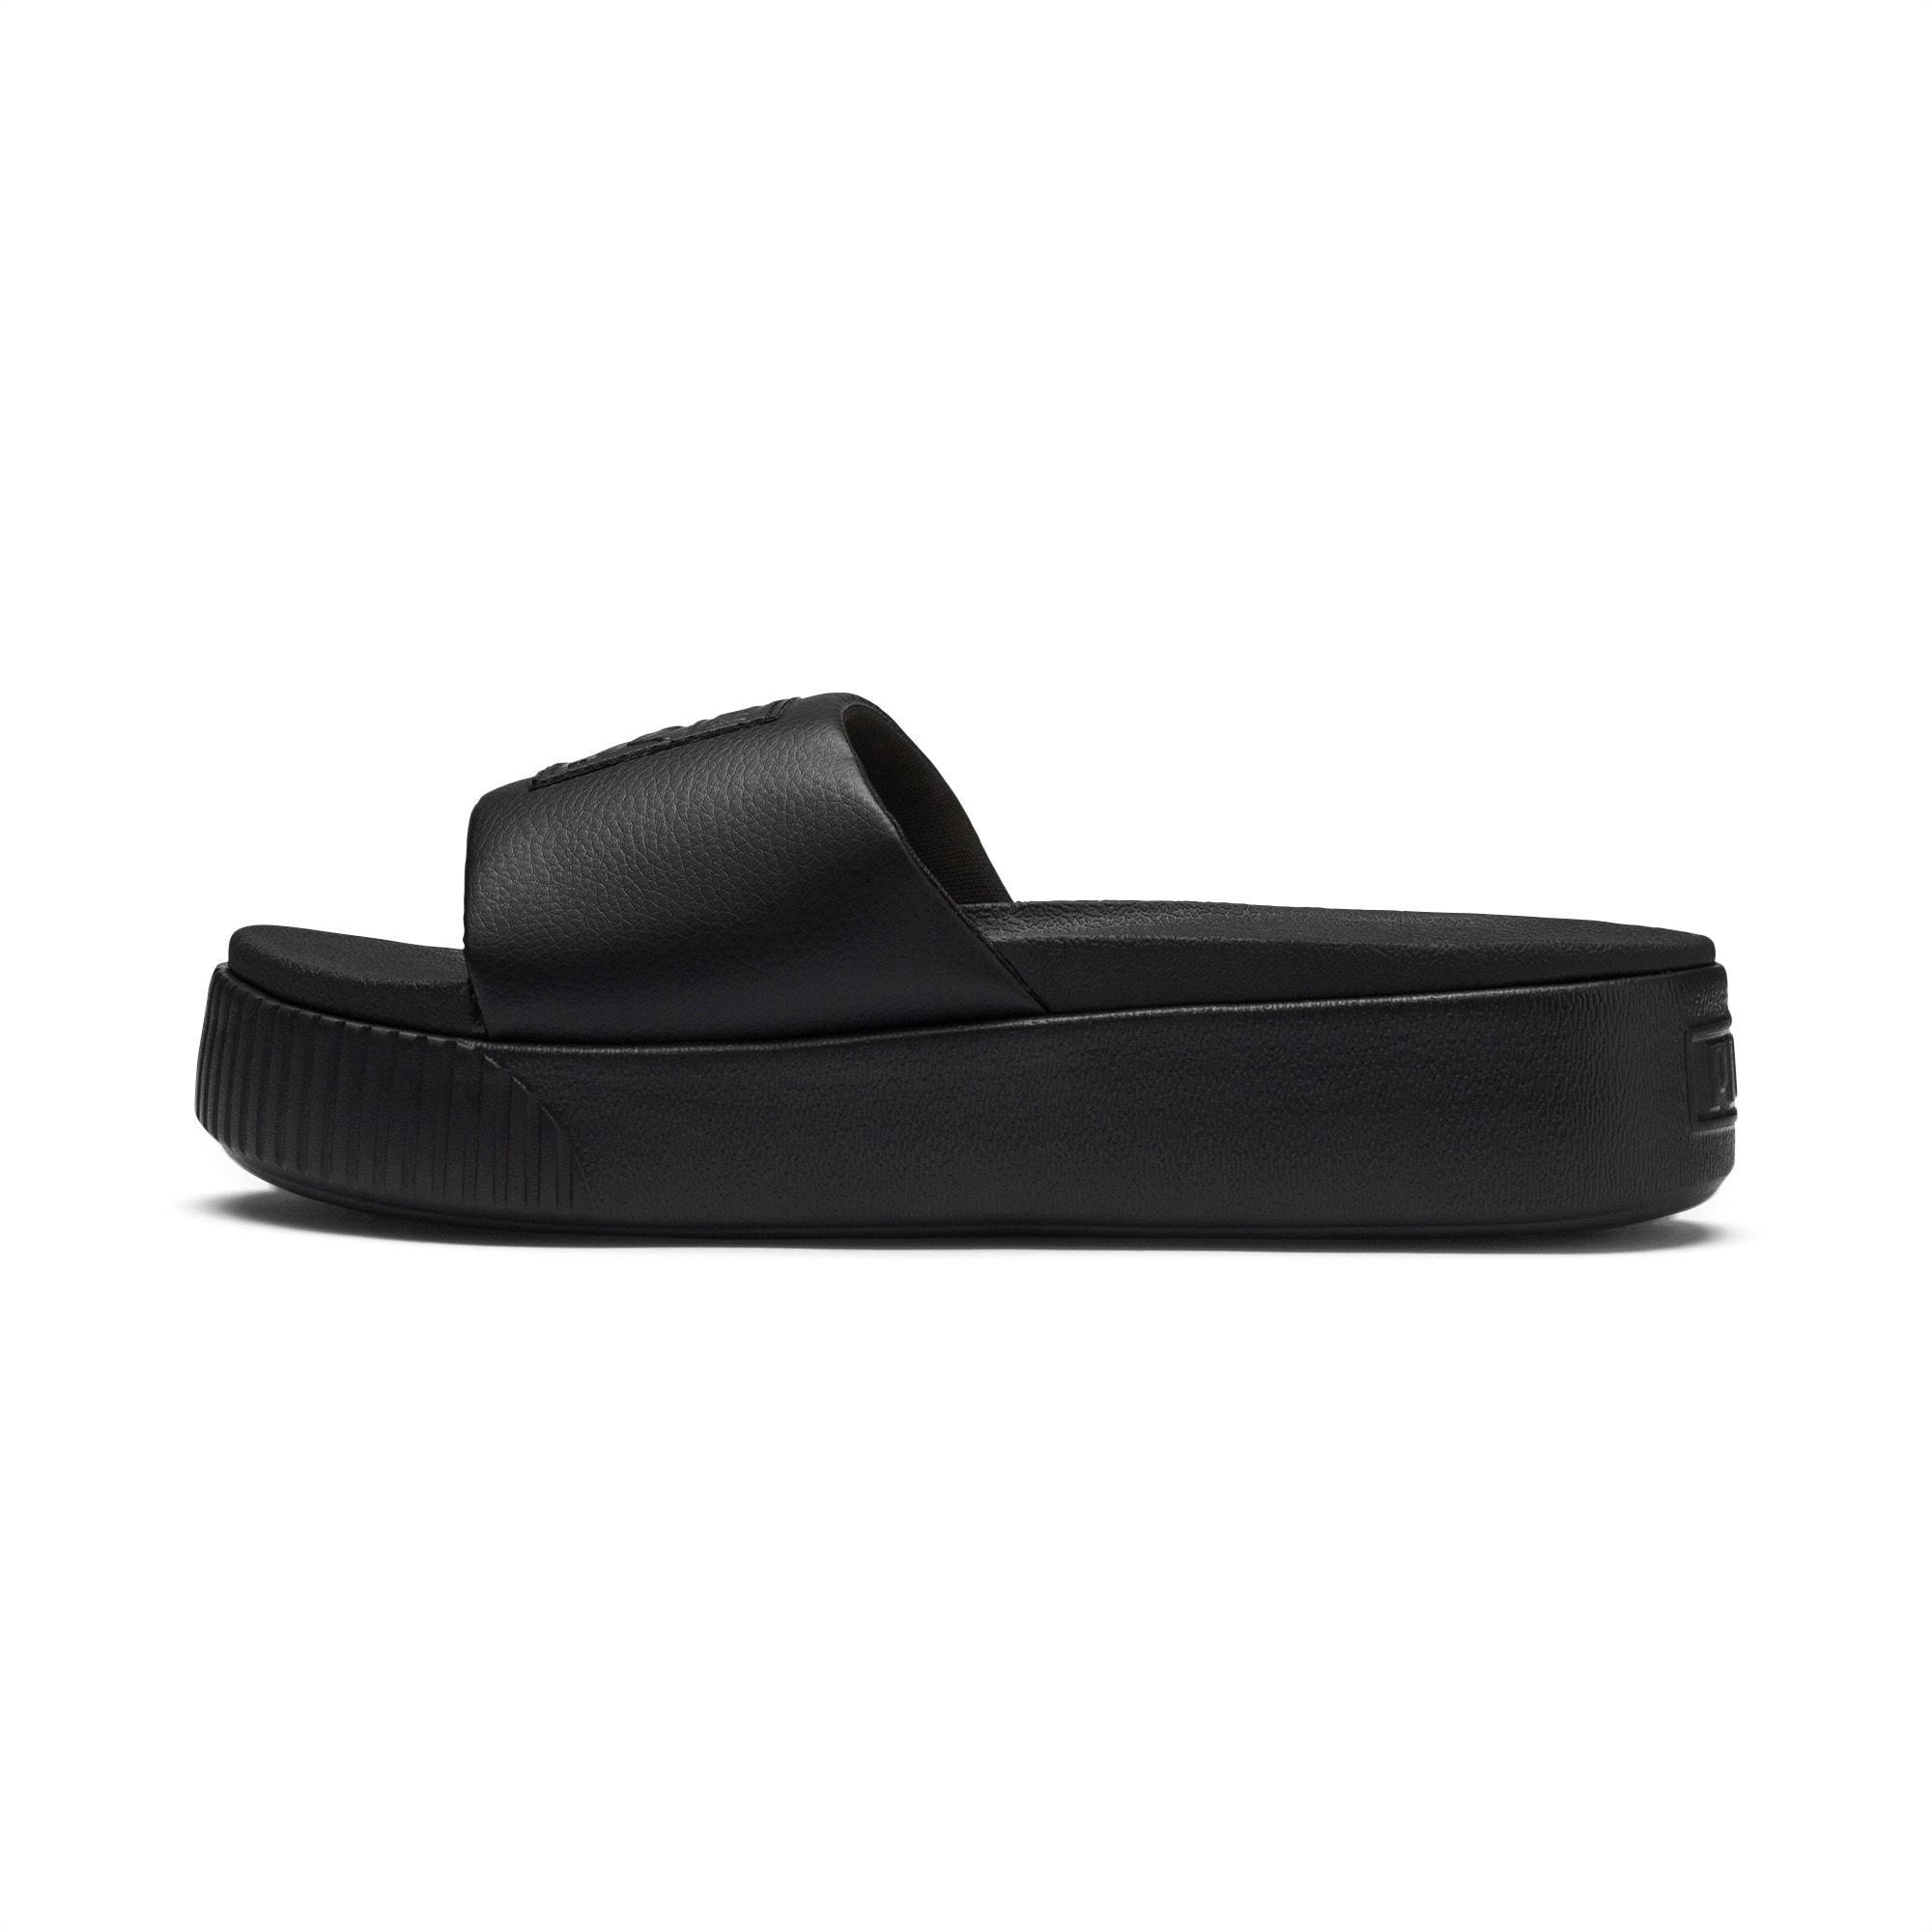 Platform Slide Women's Sandals   Puma Black-Puma Black   PUMA Slides &  Sandals   PUMA